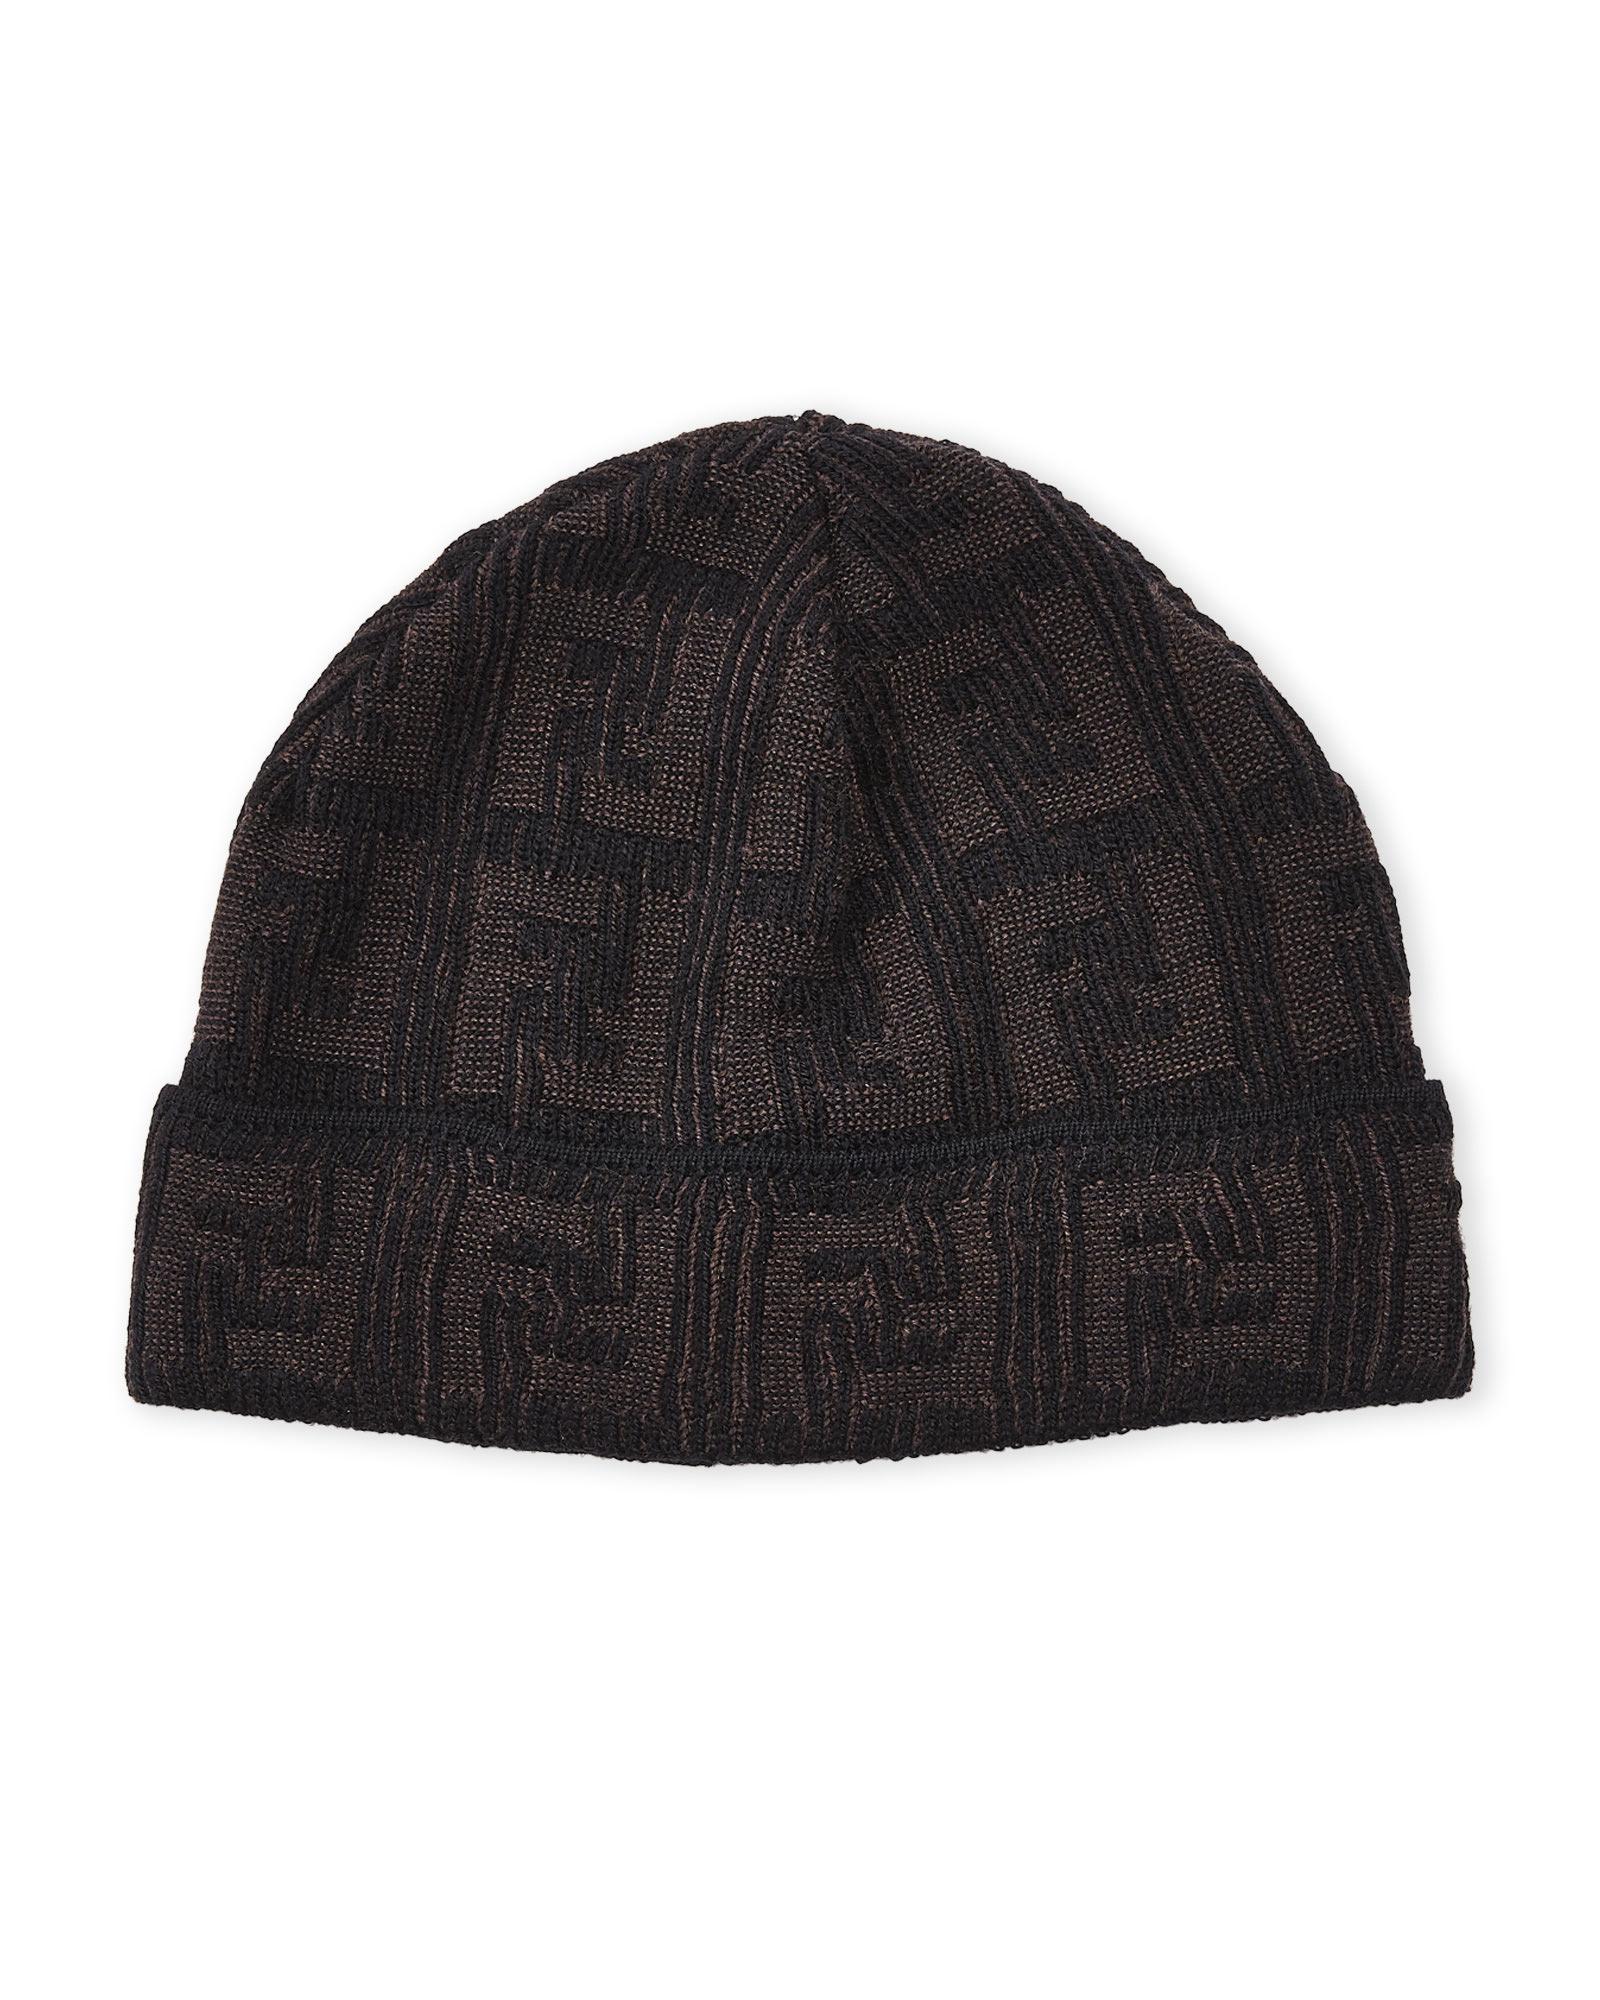 eca0ff033d7 Lyst - Fendi Zucca Wool Beanie in Brown for Men